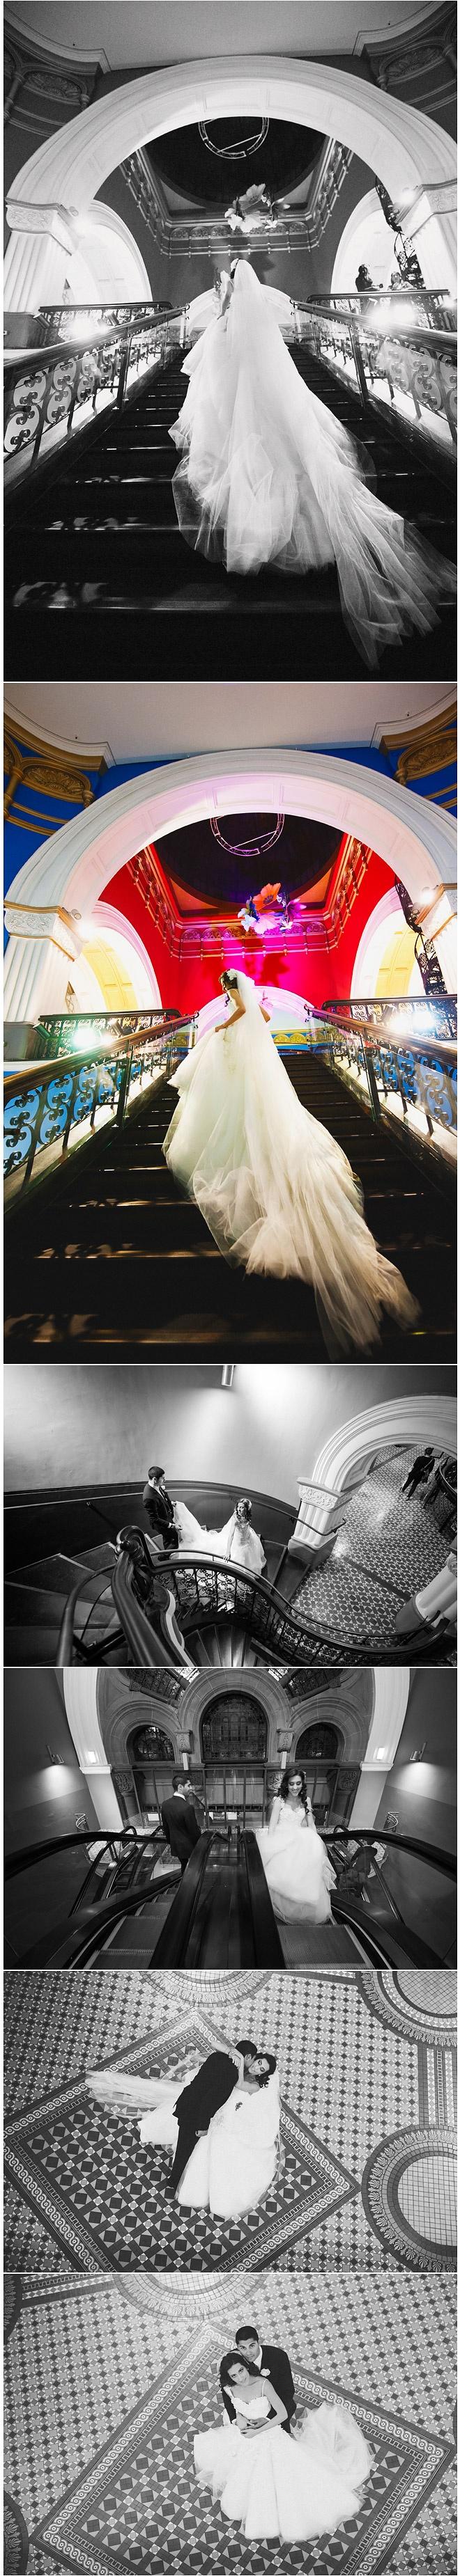 Sydney QVB photography - amazing